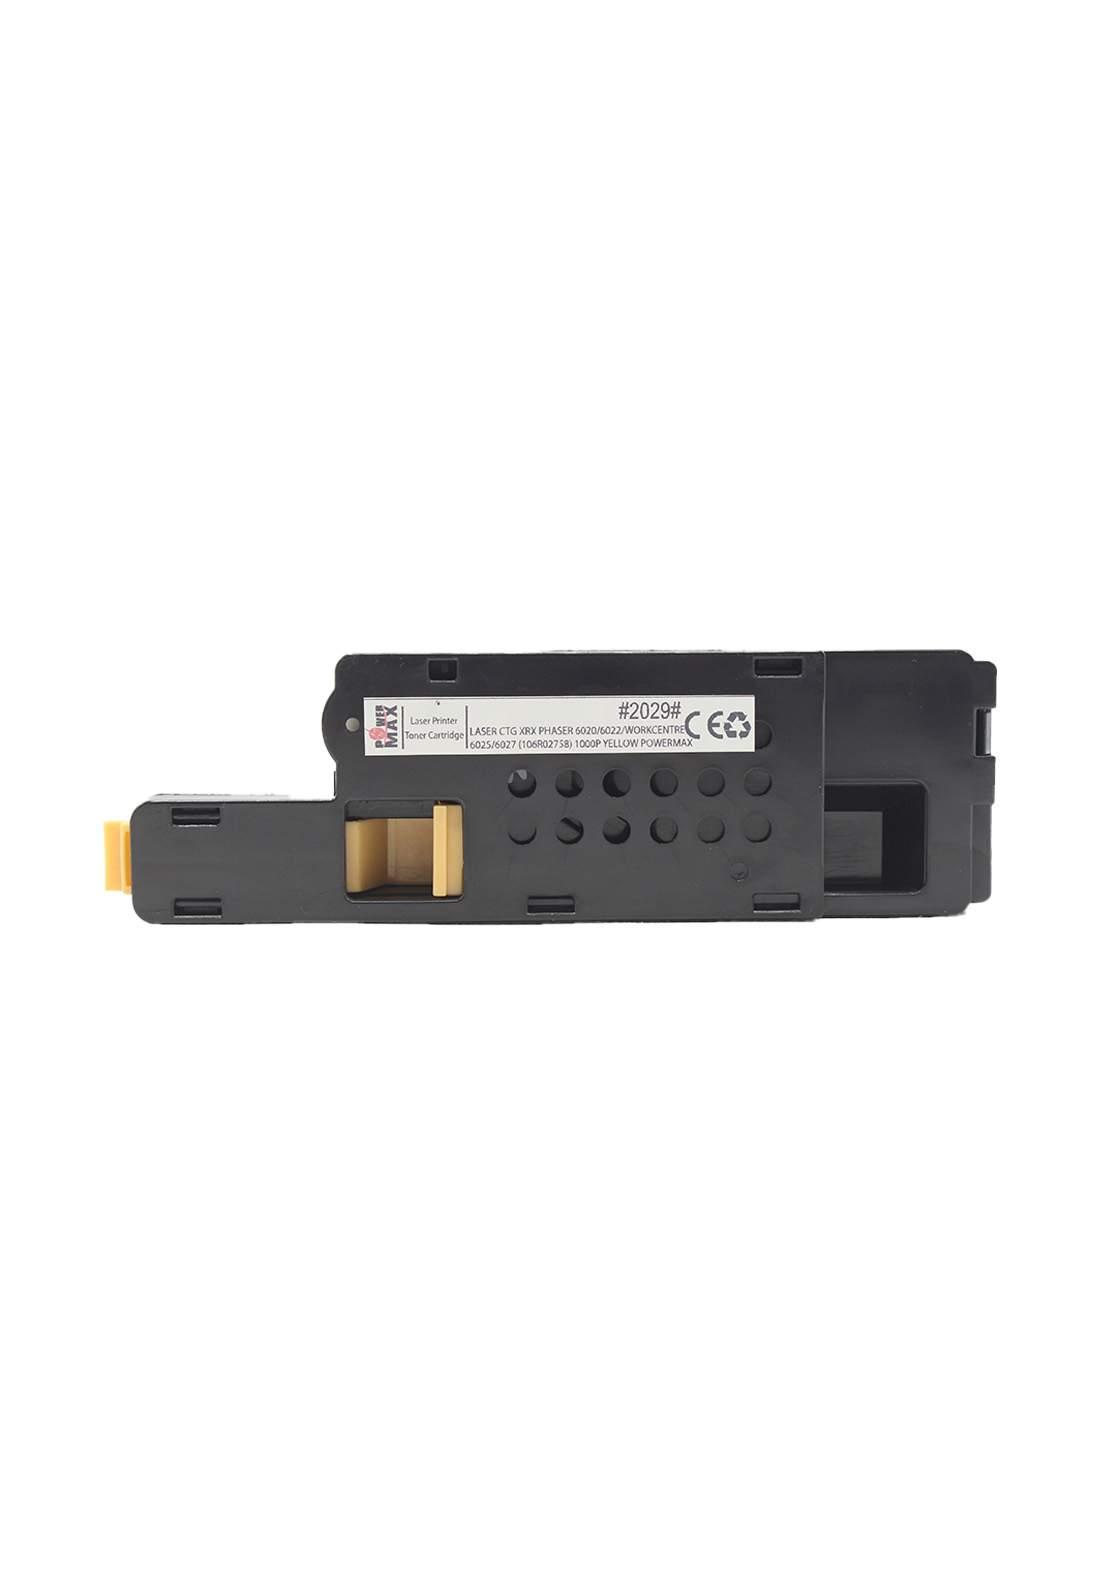 Power Max CTG Xerox Phaser 6020/6022 / Workcentre 6025/6027 (106R02758) 1000P Laser Printer Toner Cartridge خرطوشة حبر